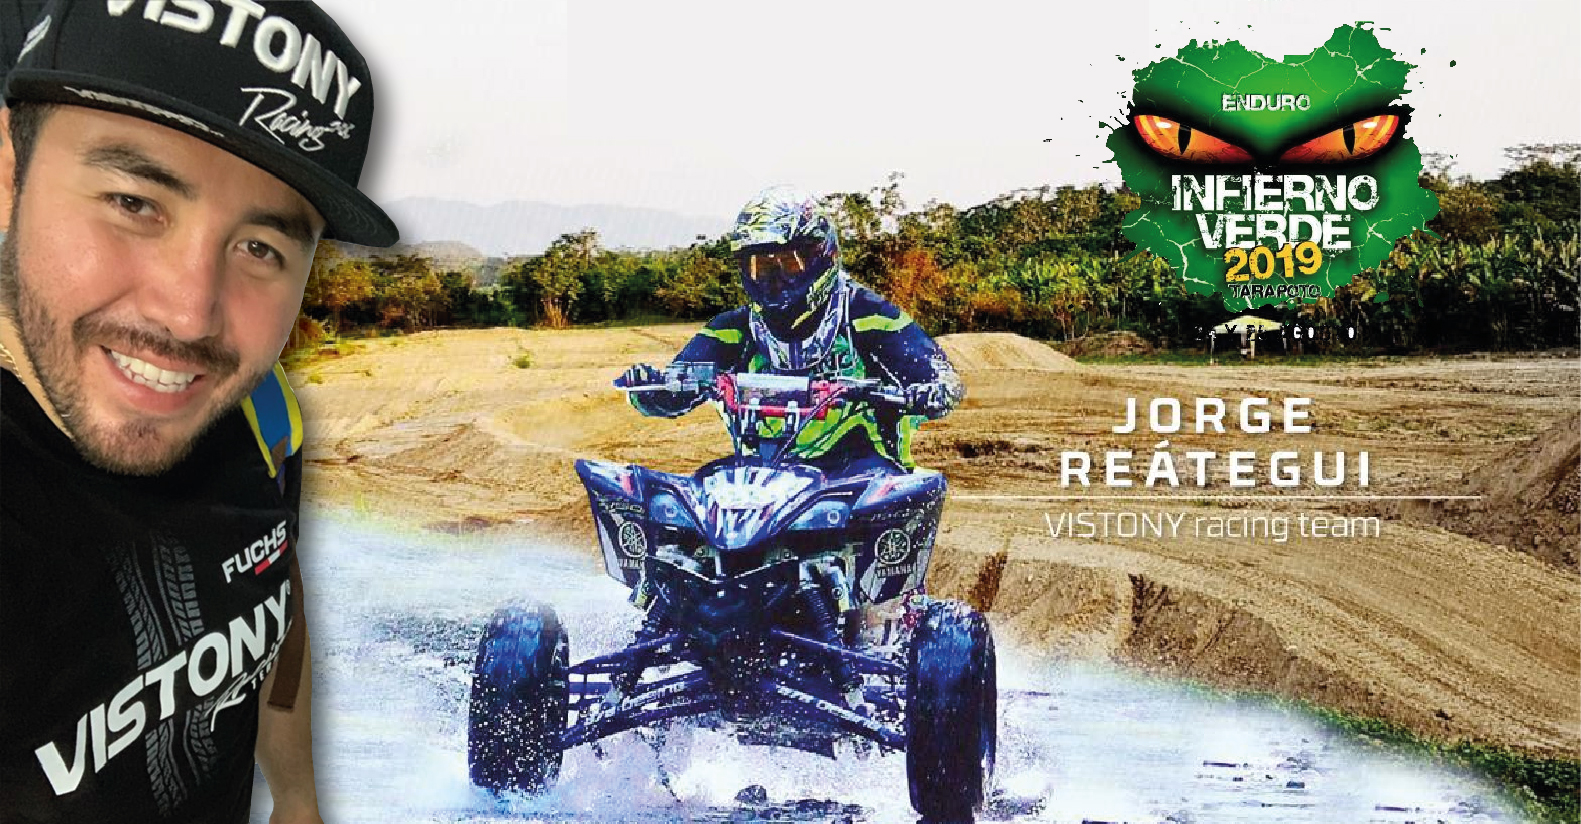 jorge-reategui-infierno-verde-2019-revista-mototec-04